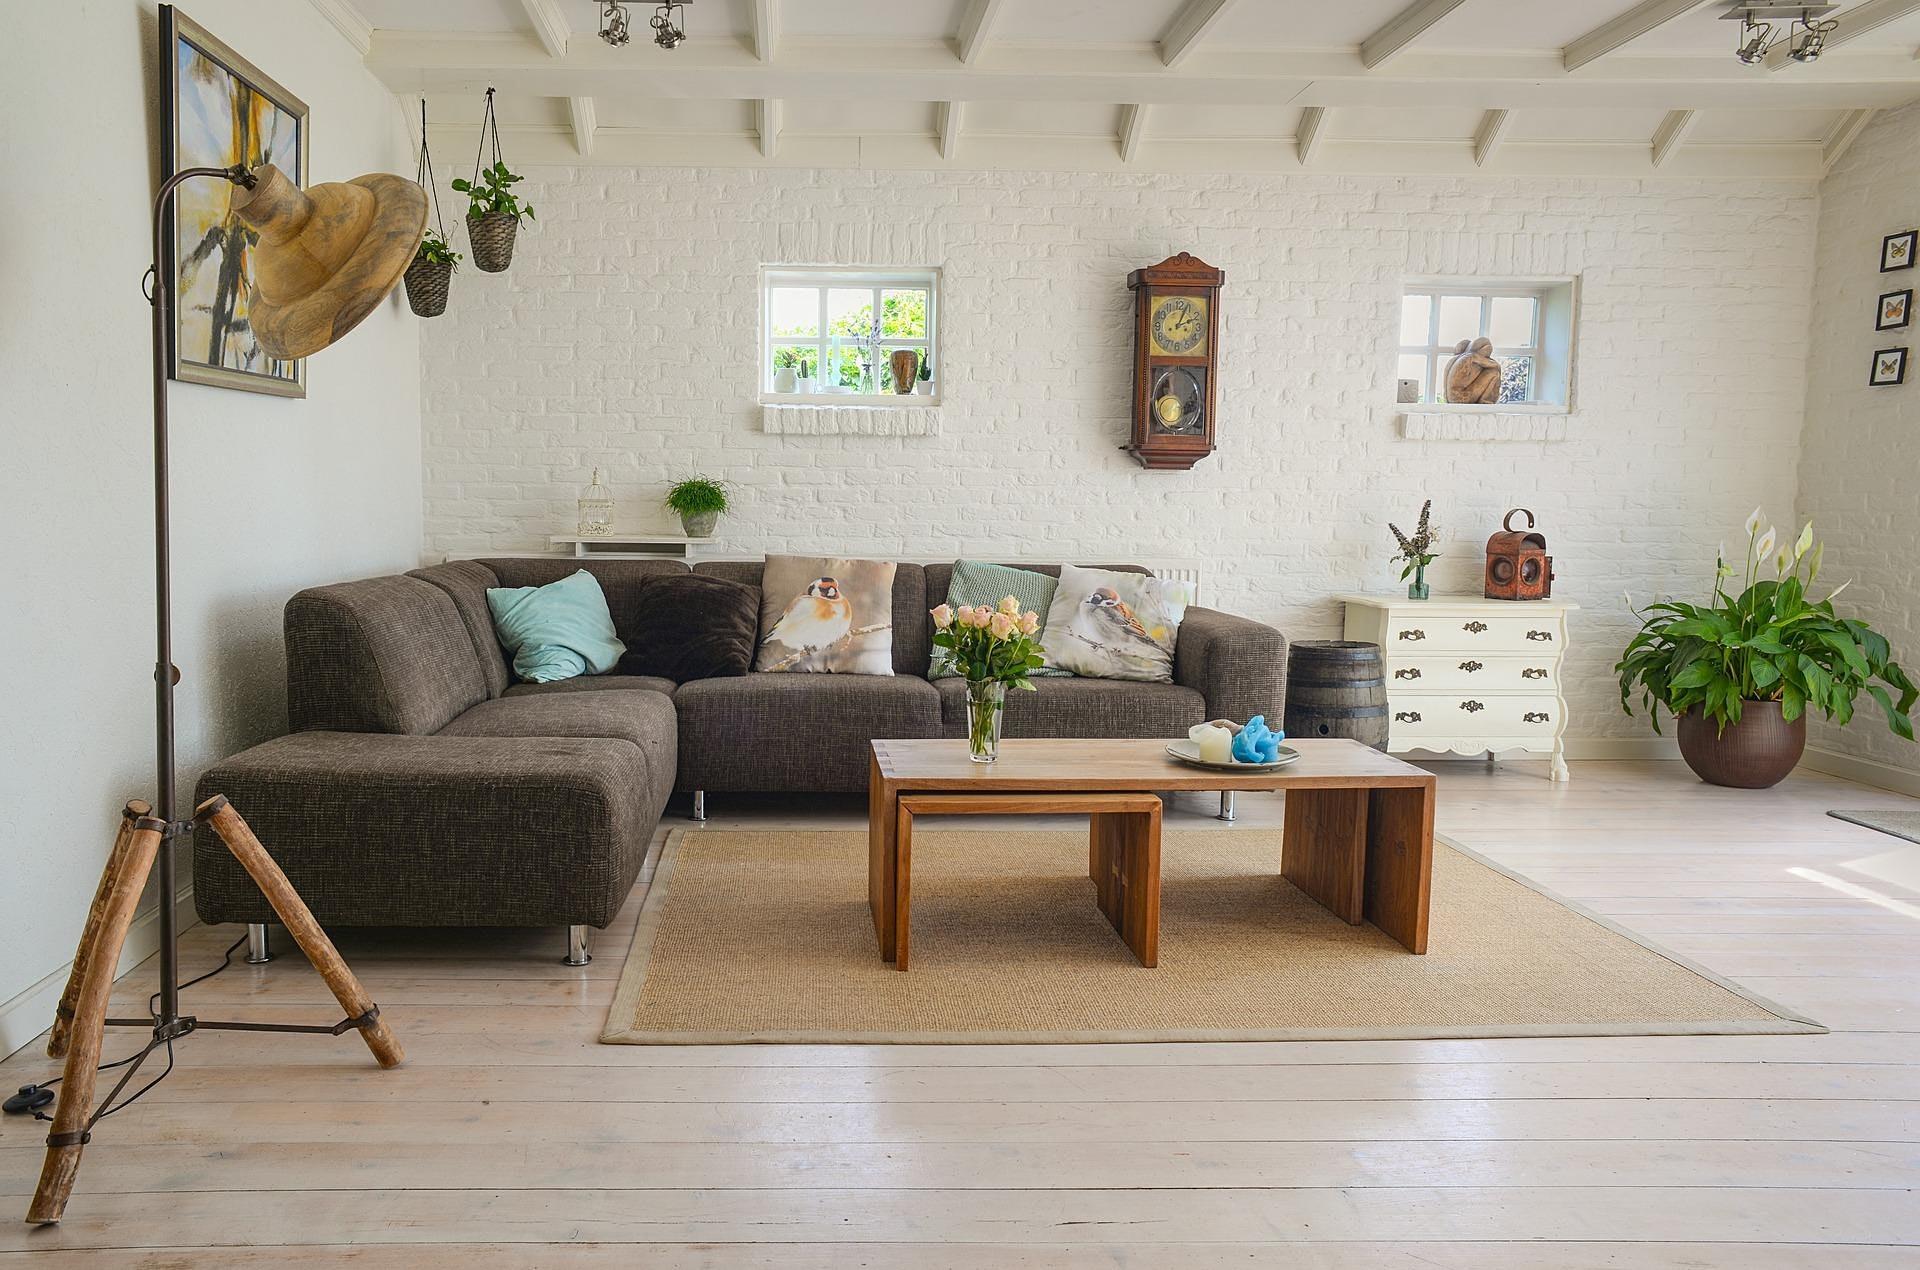 Creating Your Own Self Retreat At Home  Led by Tina Ng